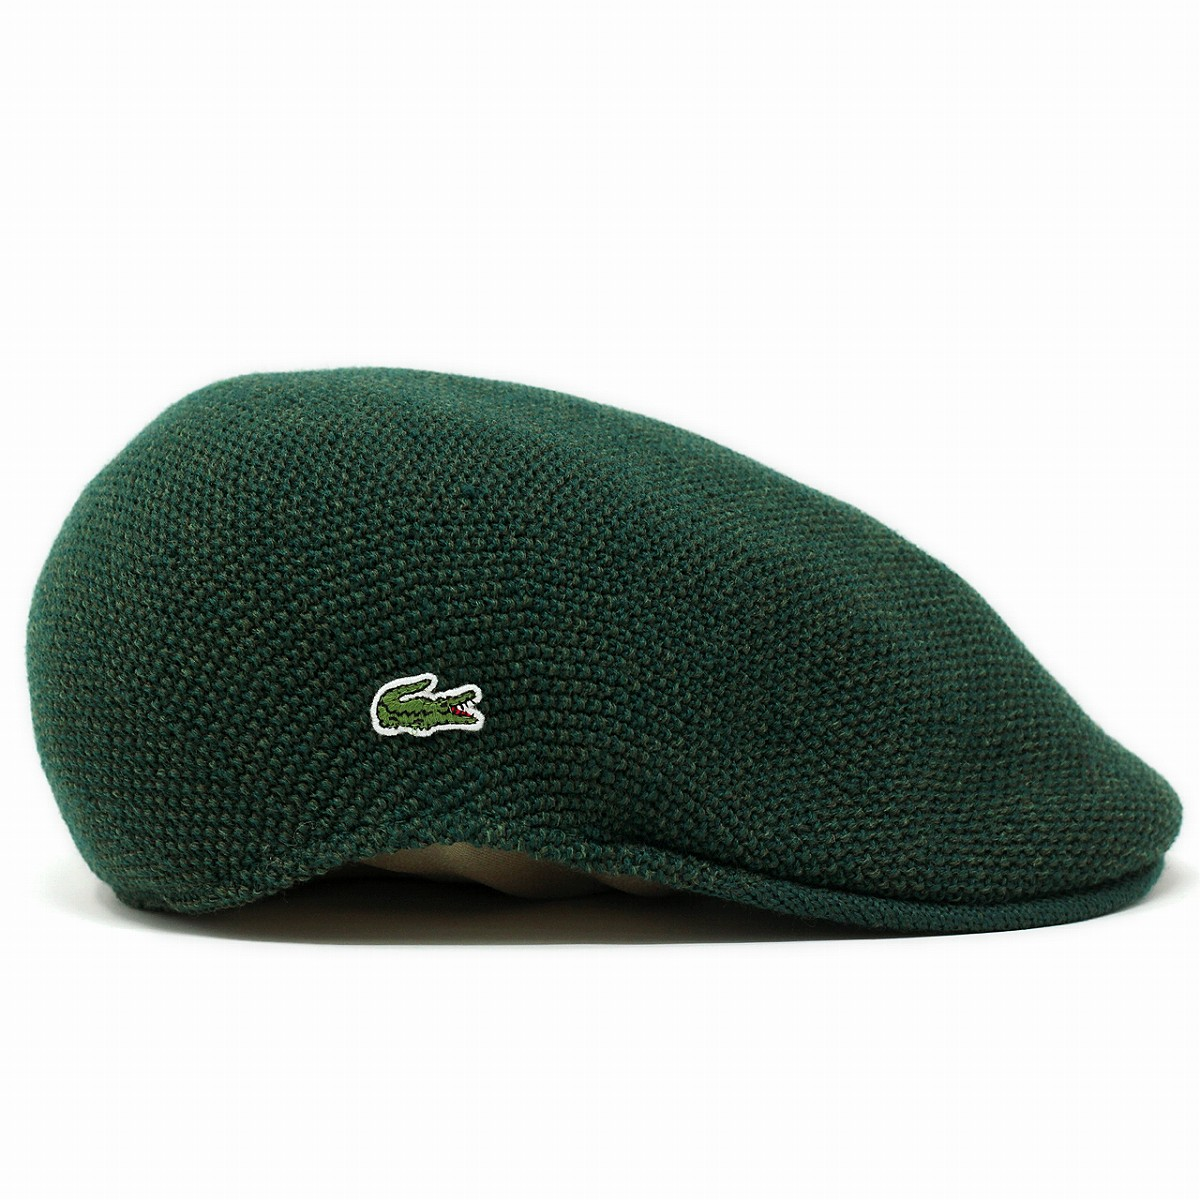 d165981e Hunting Hat mens LACOSTE hunting ladies Lacoste fall/winter lacoste Hunting  Hat men's knit hat LACOSTE cap thurmont Regal Al size adjustable fashion ...